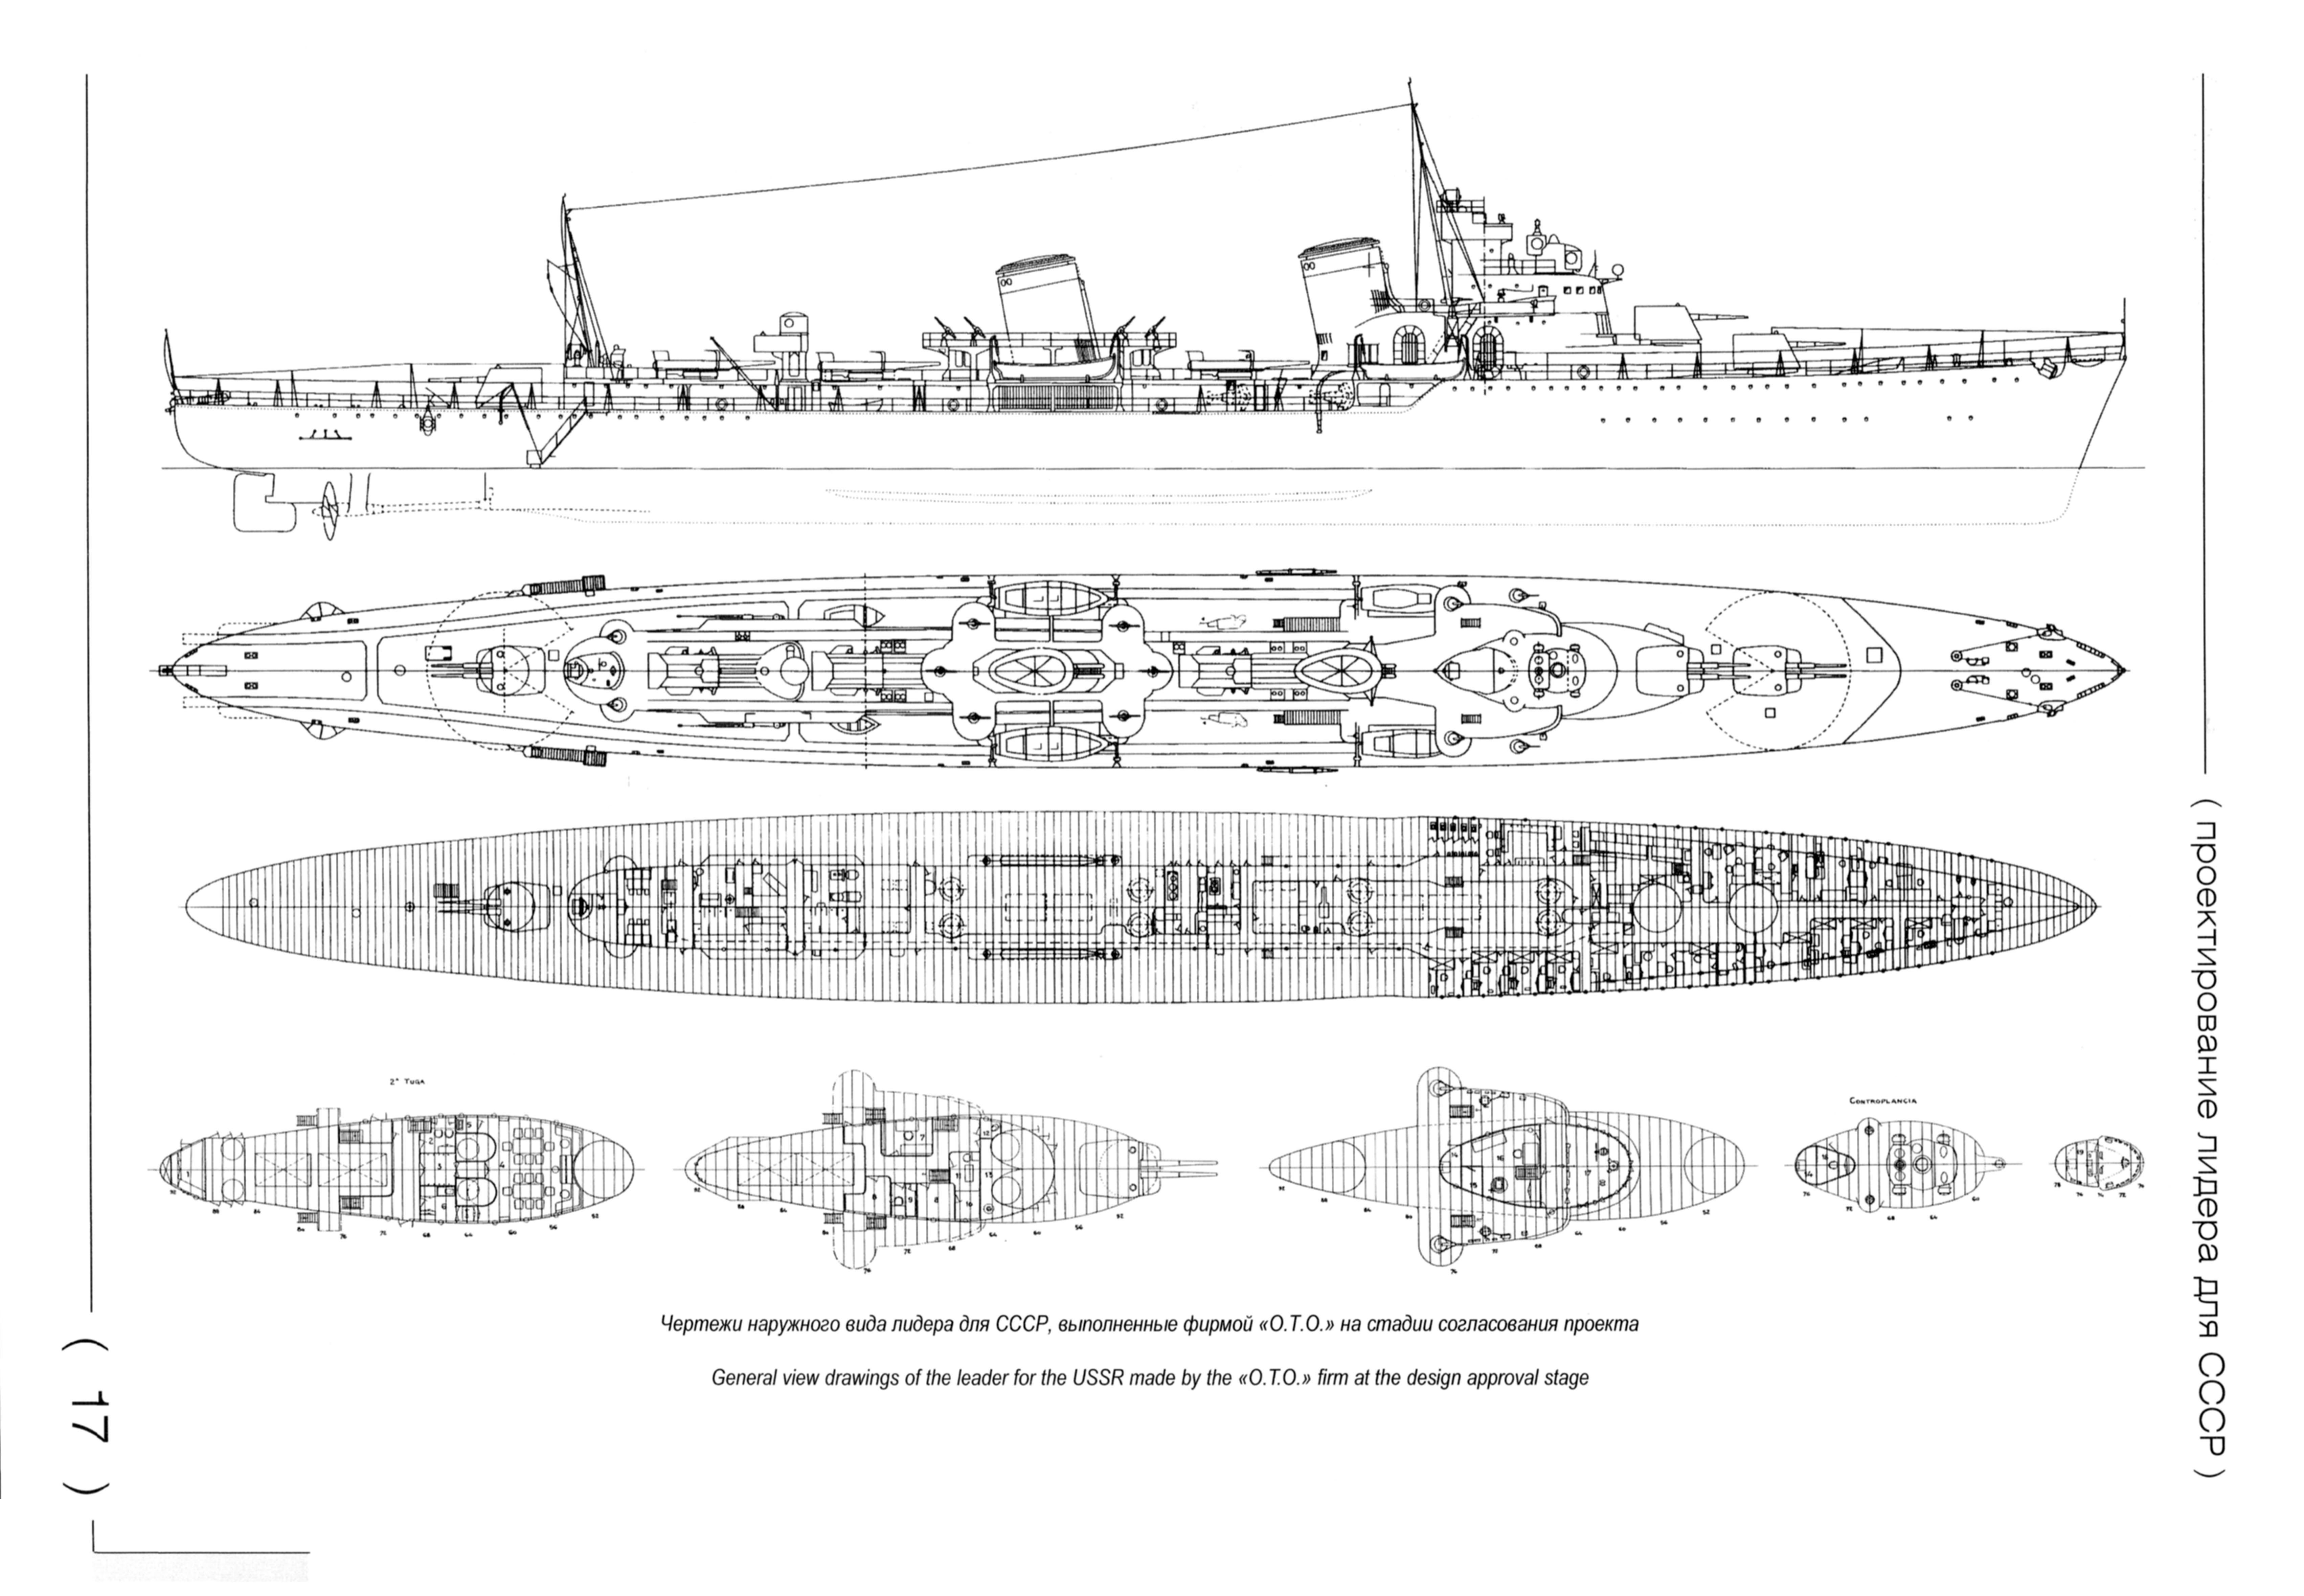 Tashkent  The Blue  U0026quot Cruiser U0026quot  Of The Red Fleet